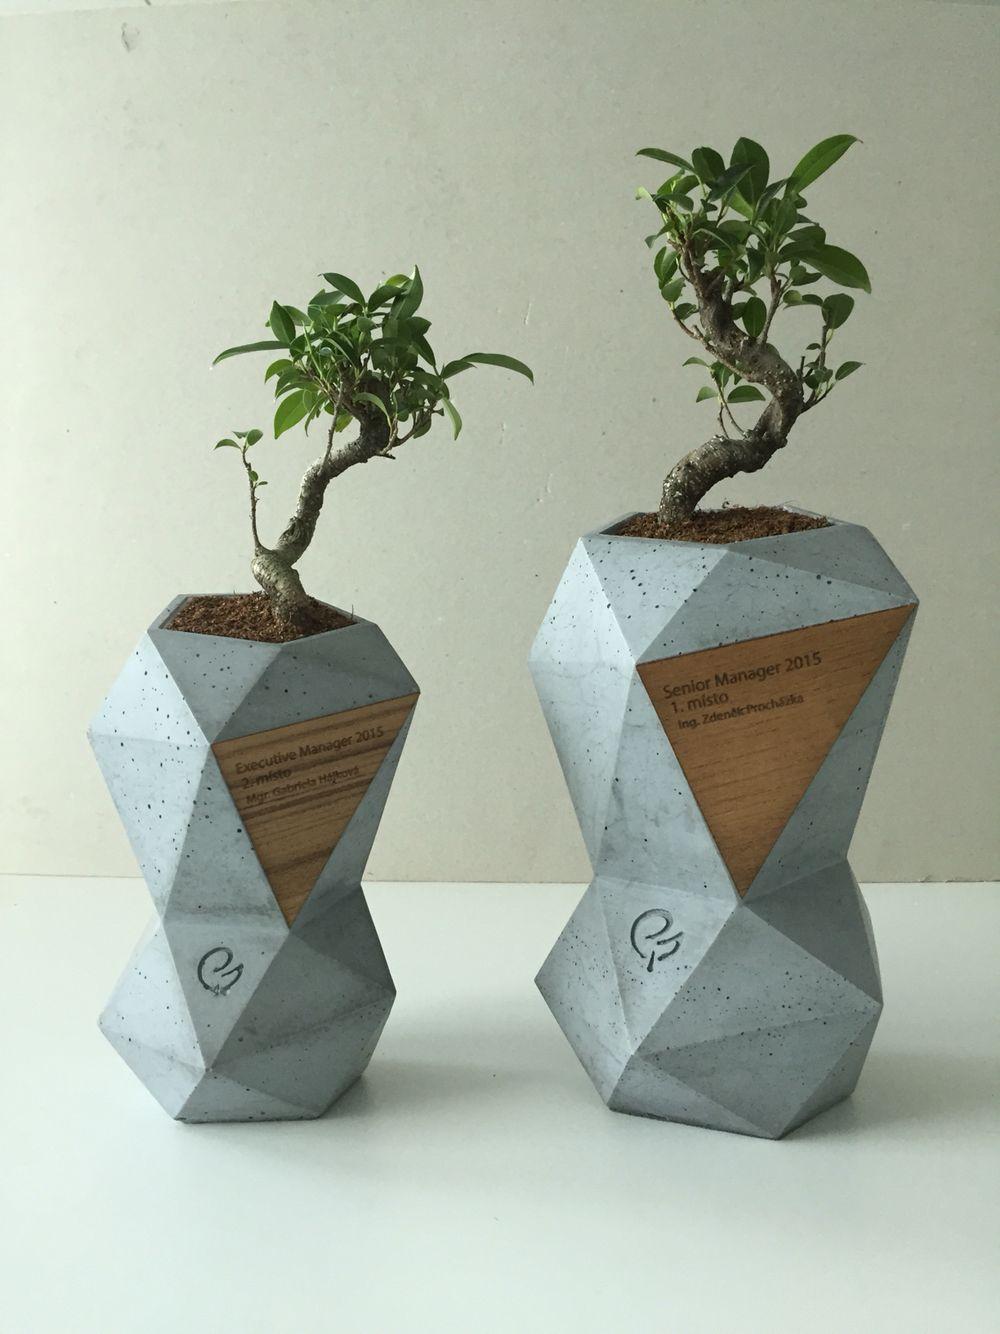 Jan Lamr and Gravelli design Concrete Award